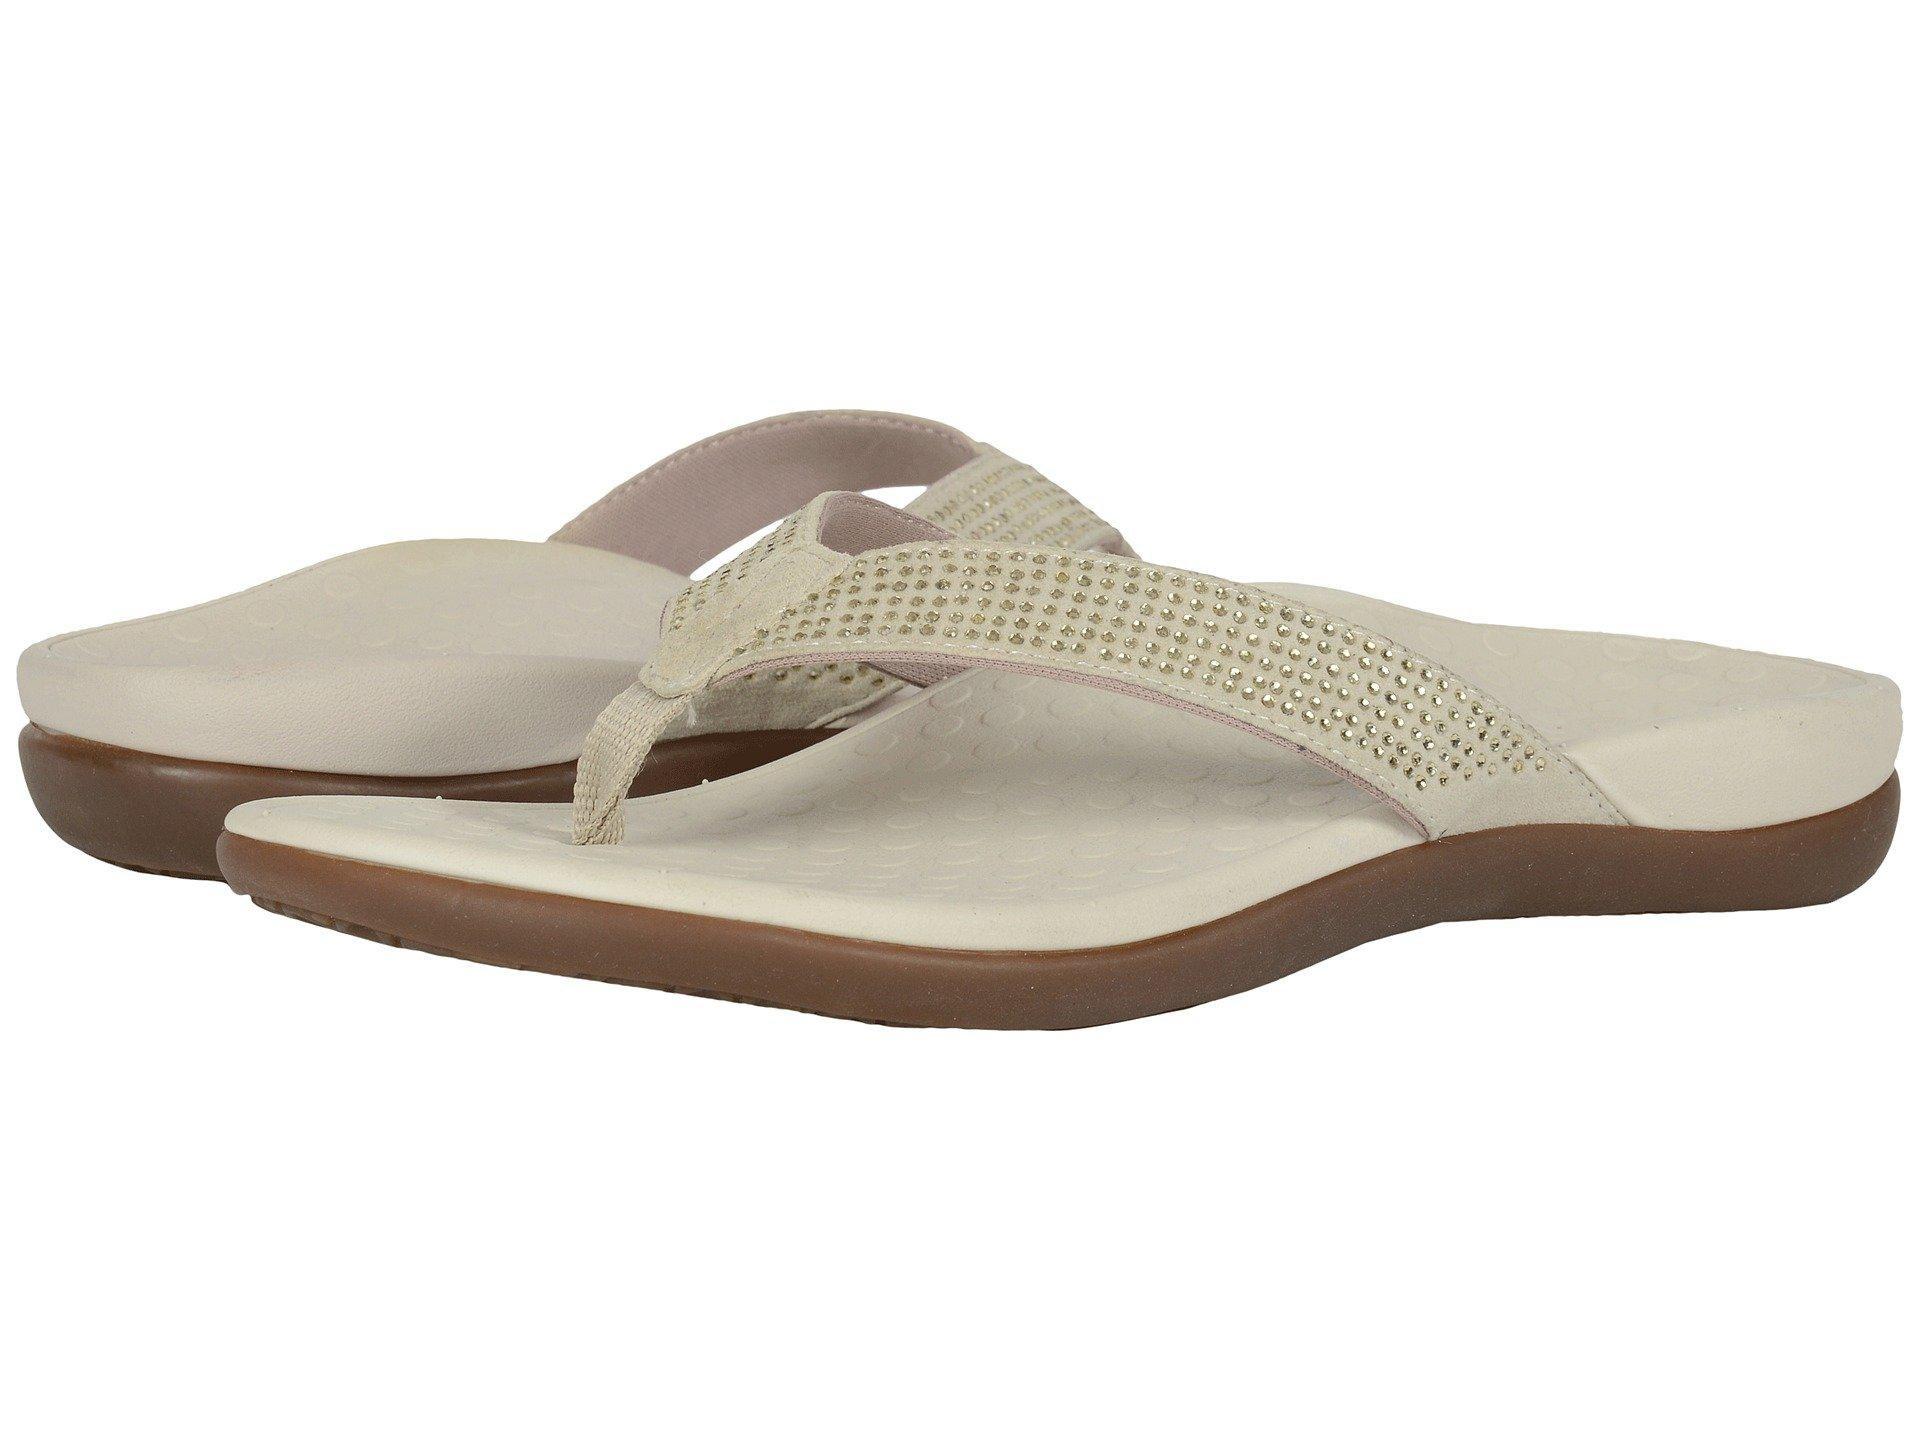 e4c03c52971f Lyst - Vionic Tide Rhinestone (black) Women s Sandals in Metallic